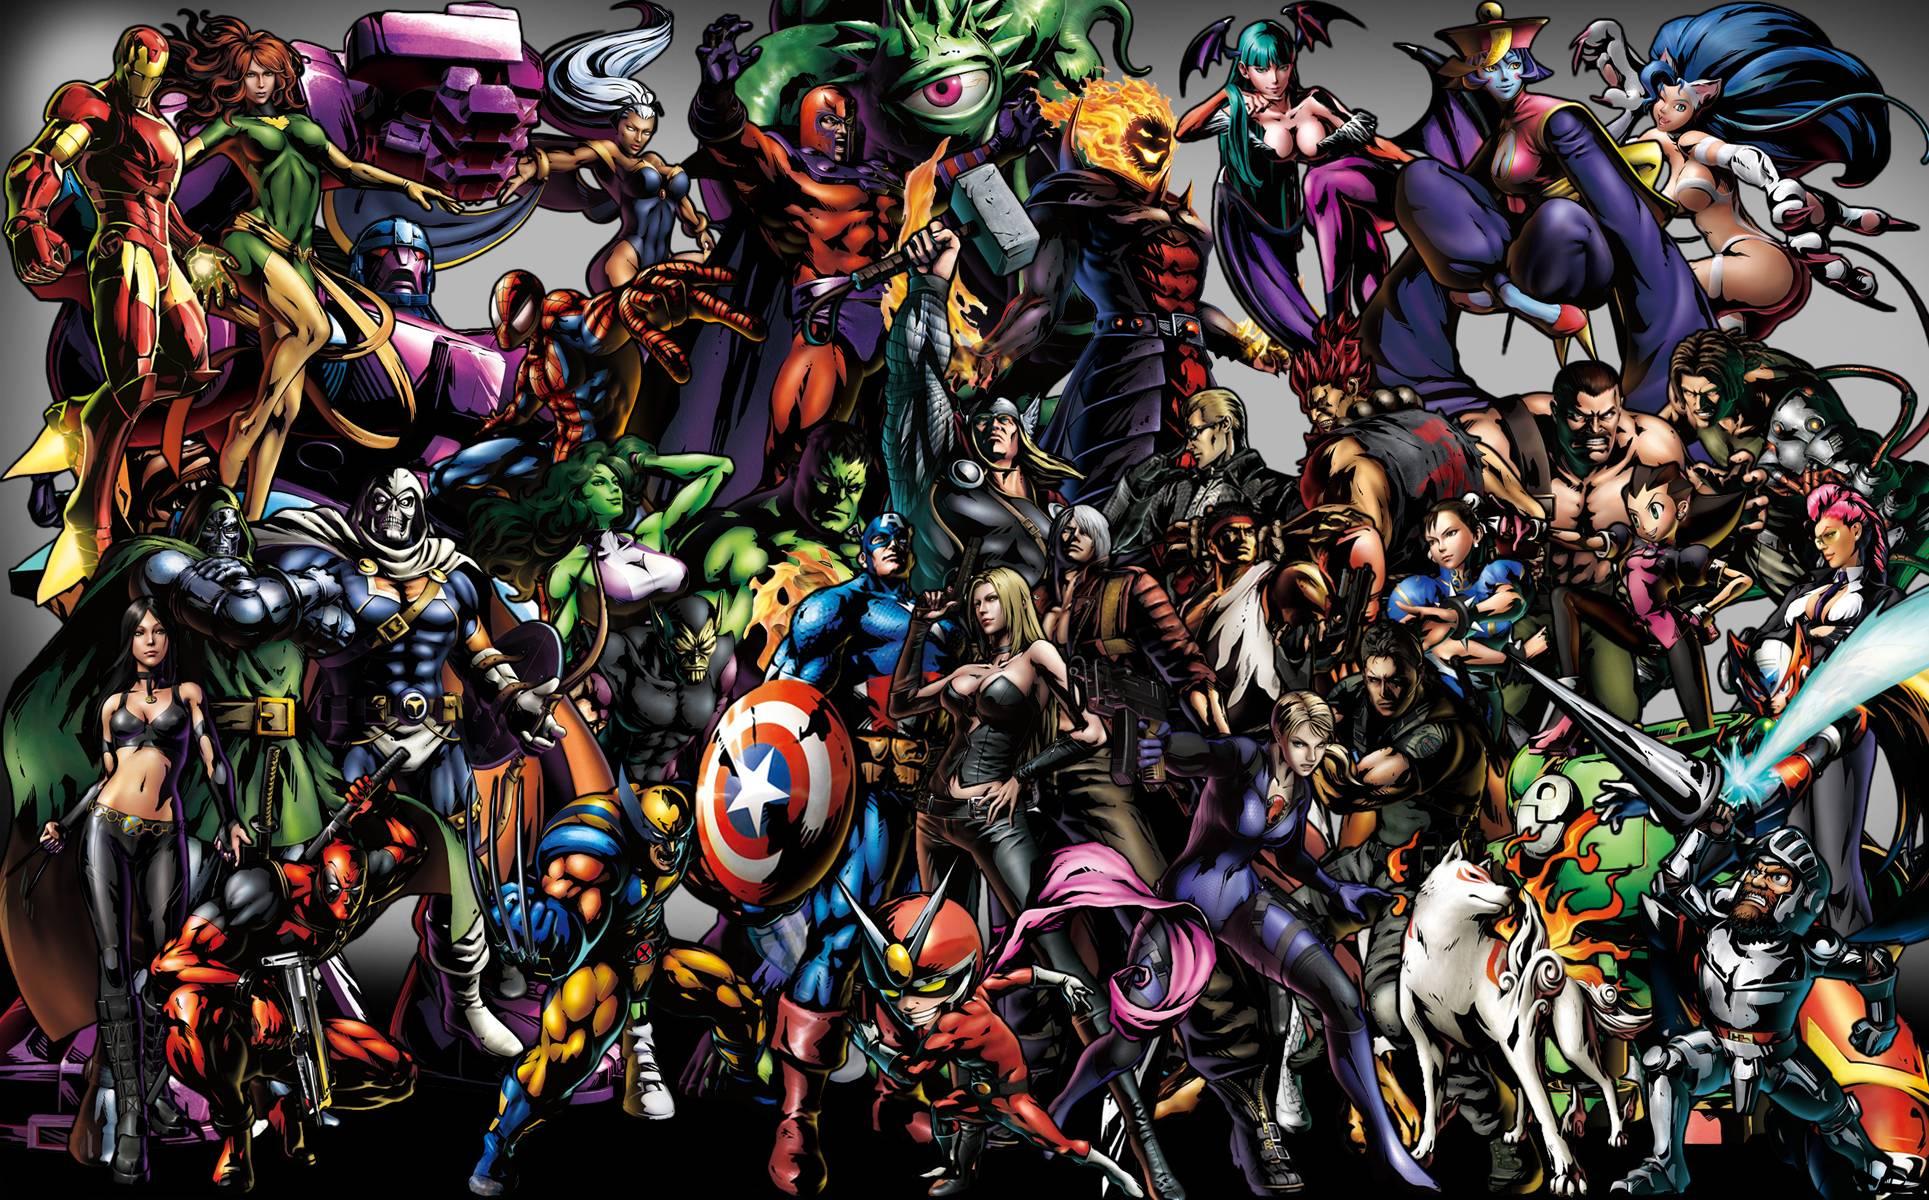 Marvel Vs Dc Wallpapers Top Free Marvel Vs Dc Backgrounds